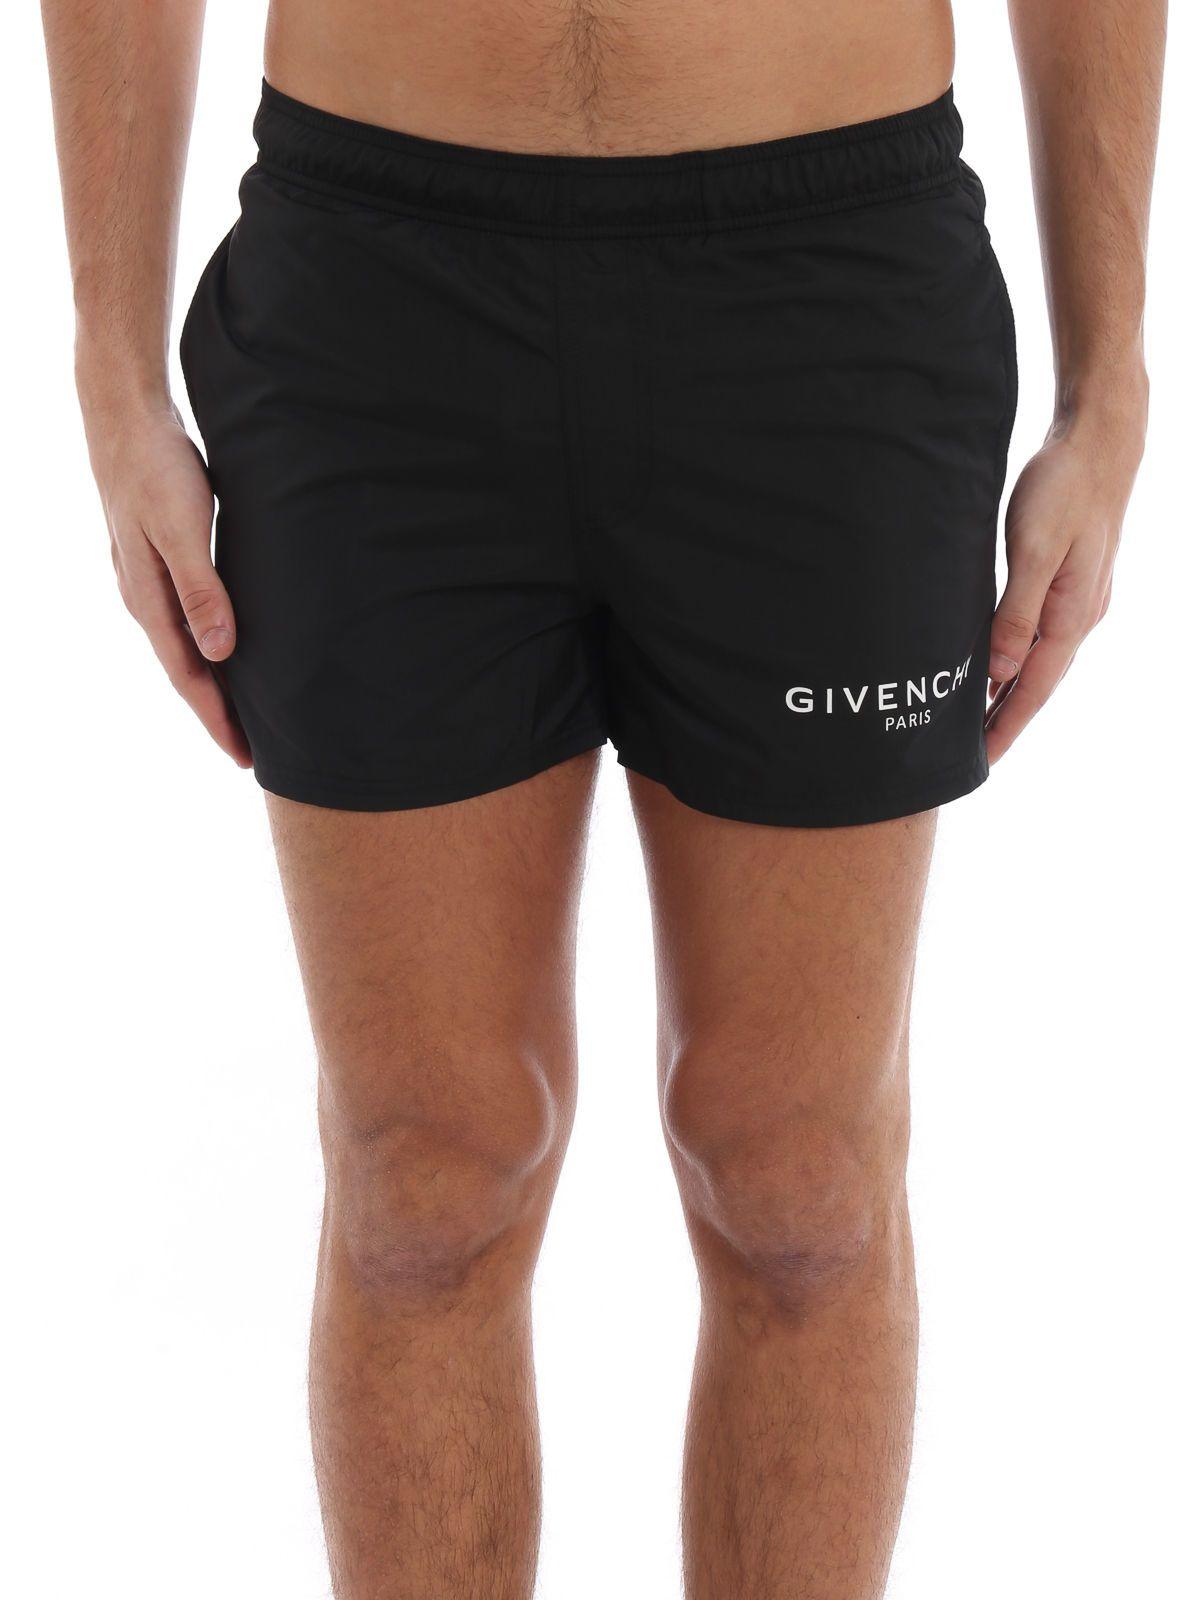 429058f6c50fd6 Givenchy Givenchy Logo Print Swim Shorts - Black - 10862844